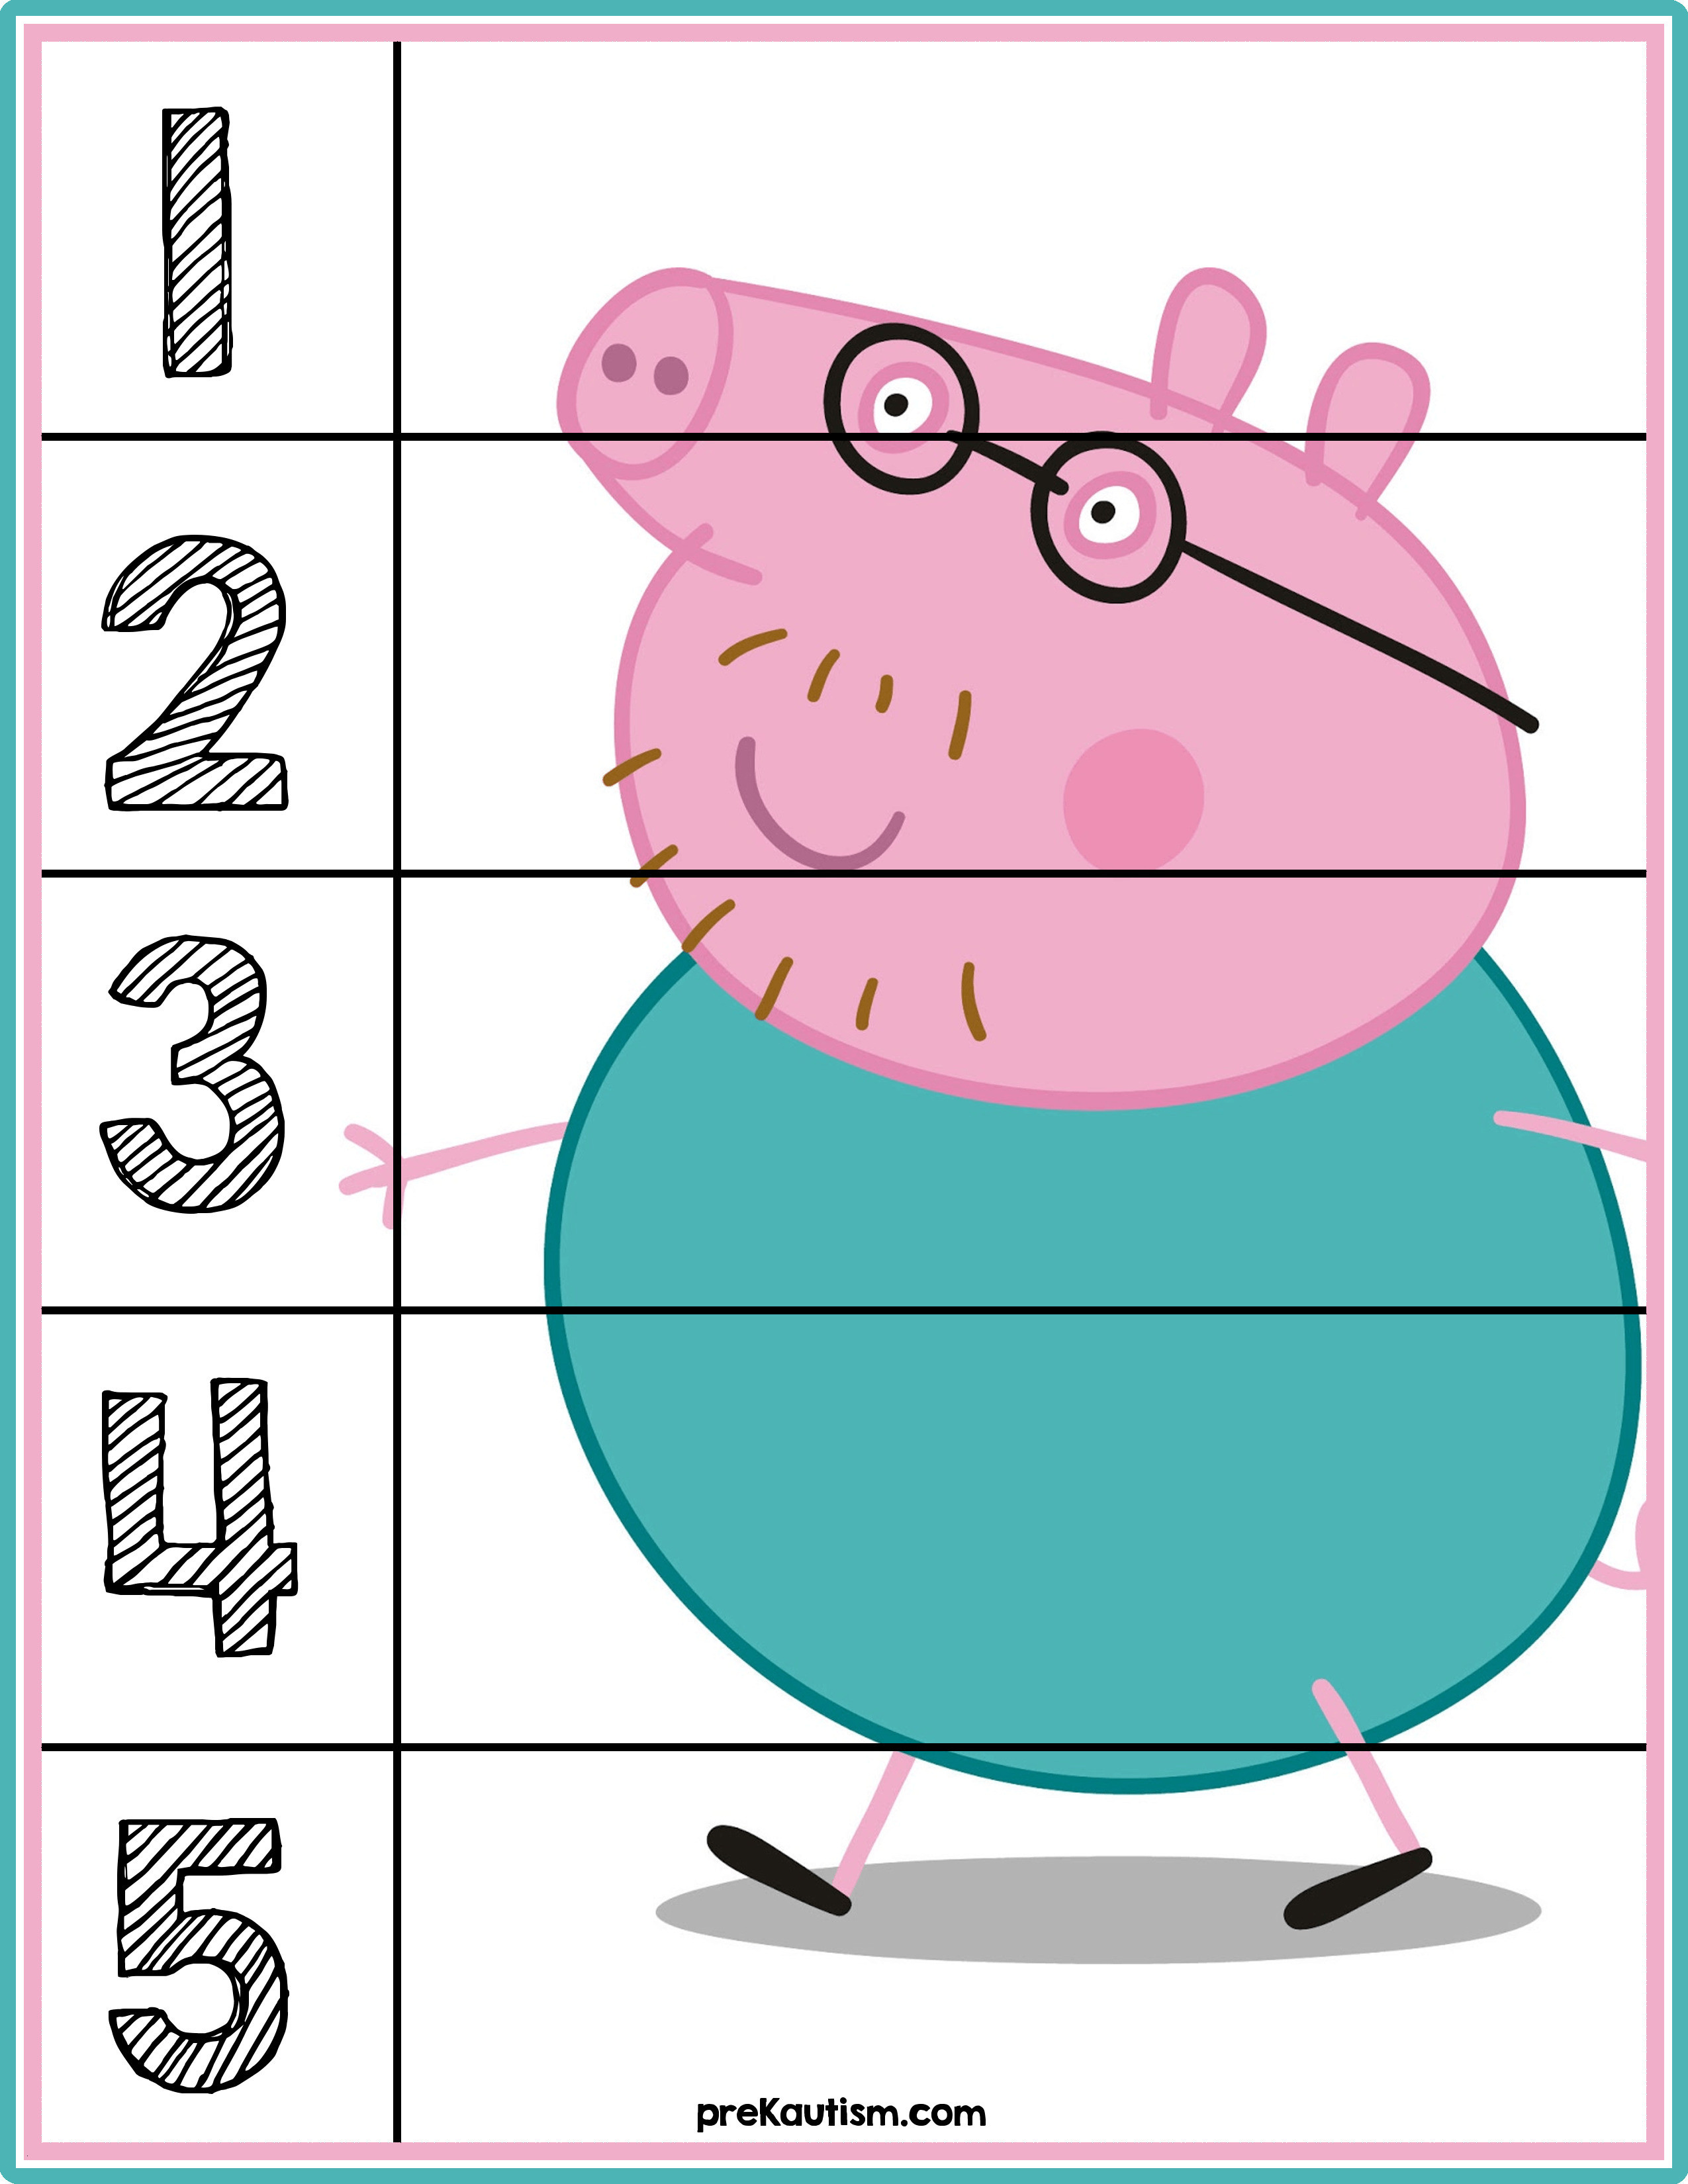 Peppa Pig Ausmalbilder Neu Peppa Pig Number Puzzles S 1 5 Luxus Peppa Pig Ausmalbilder Schön Fotografieren